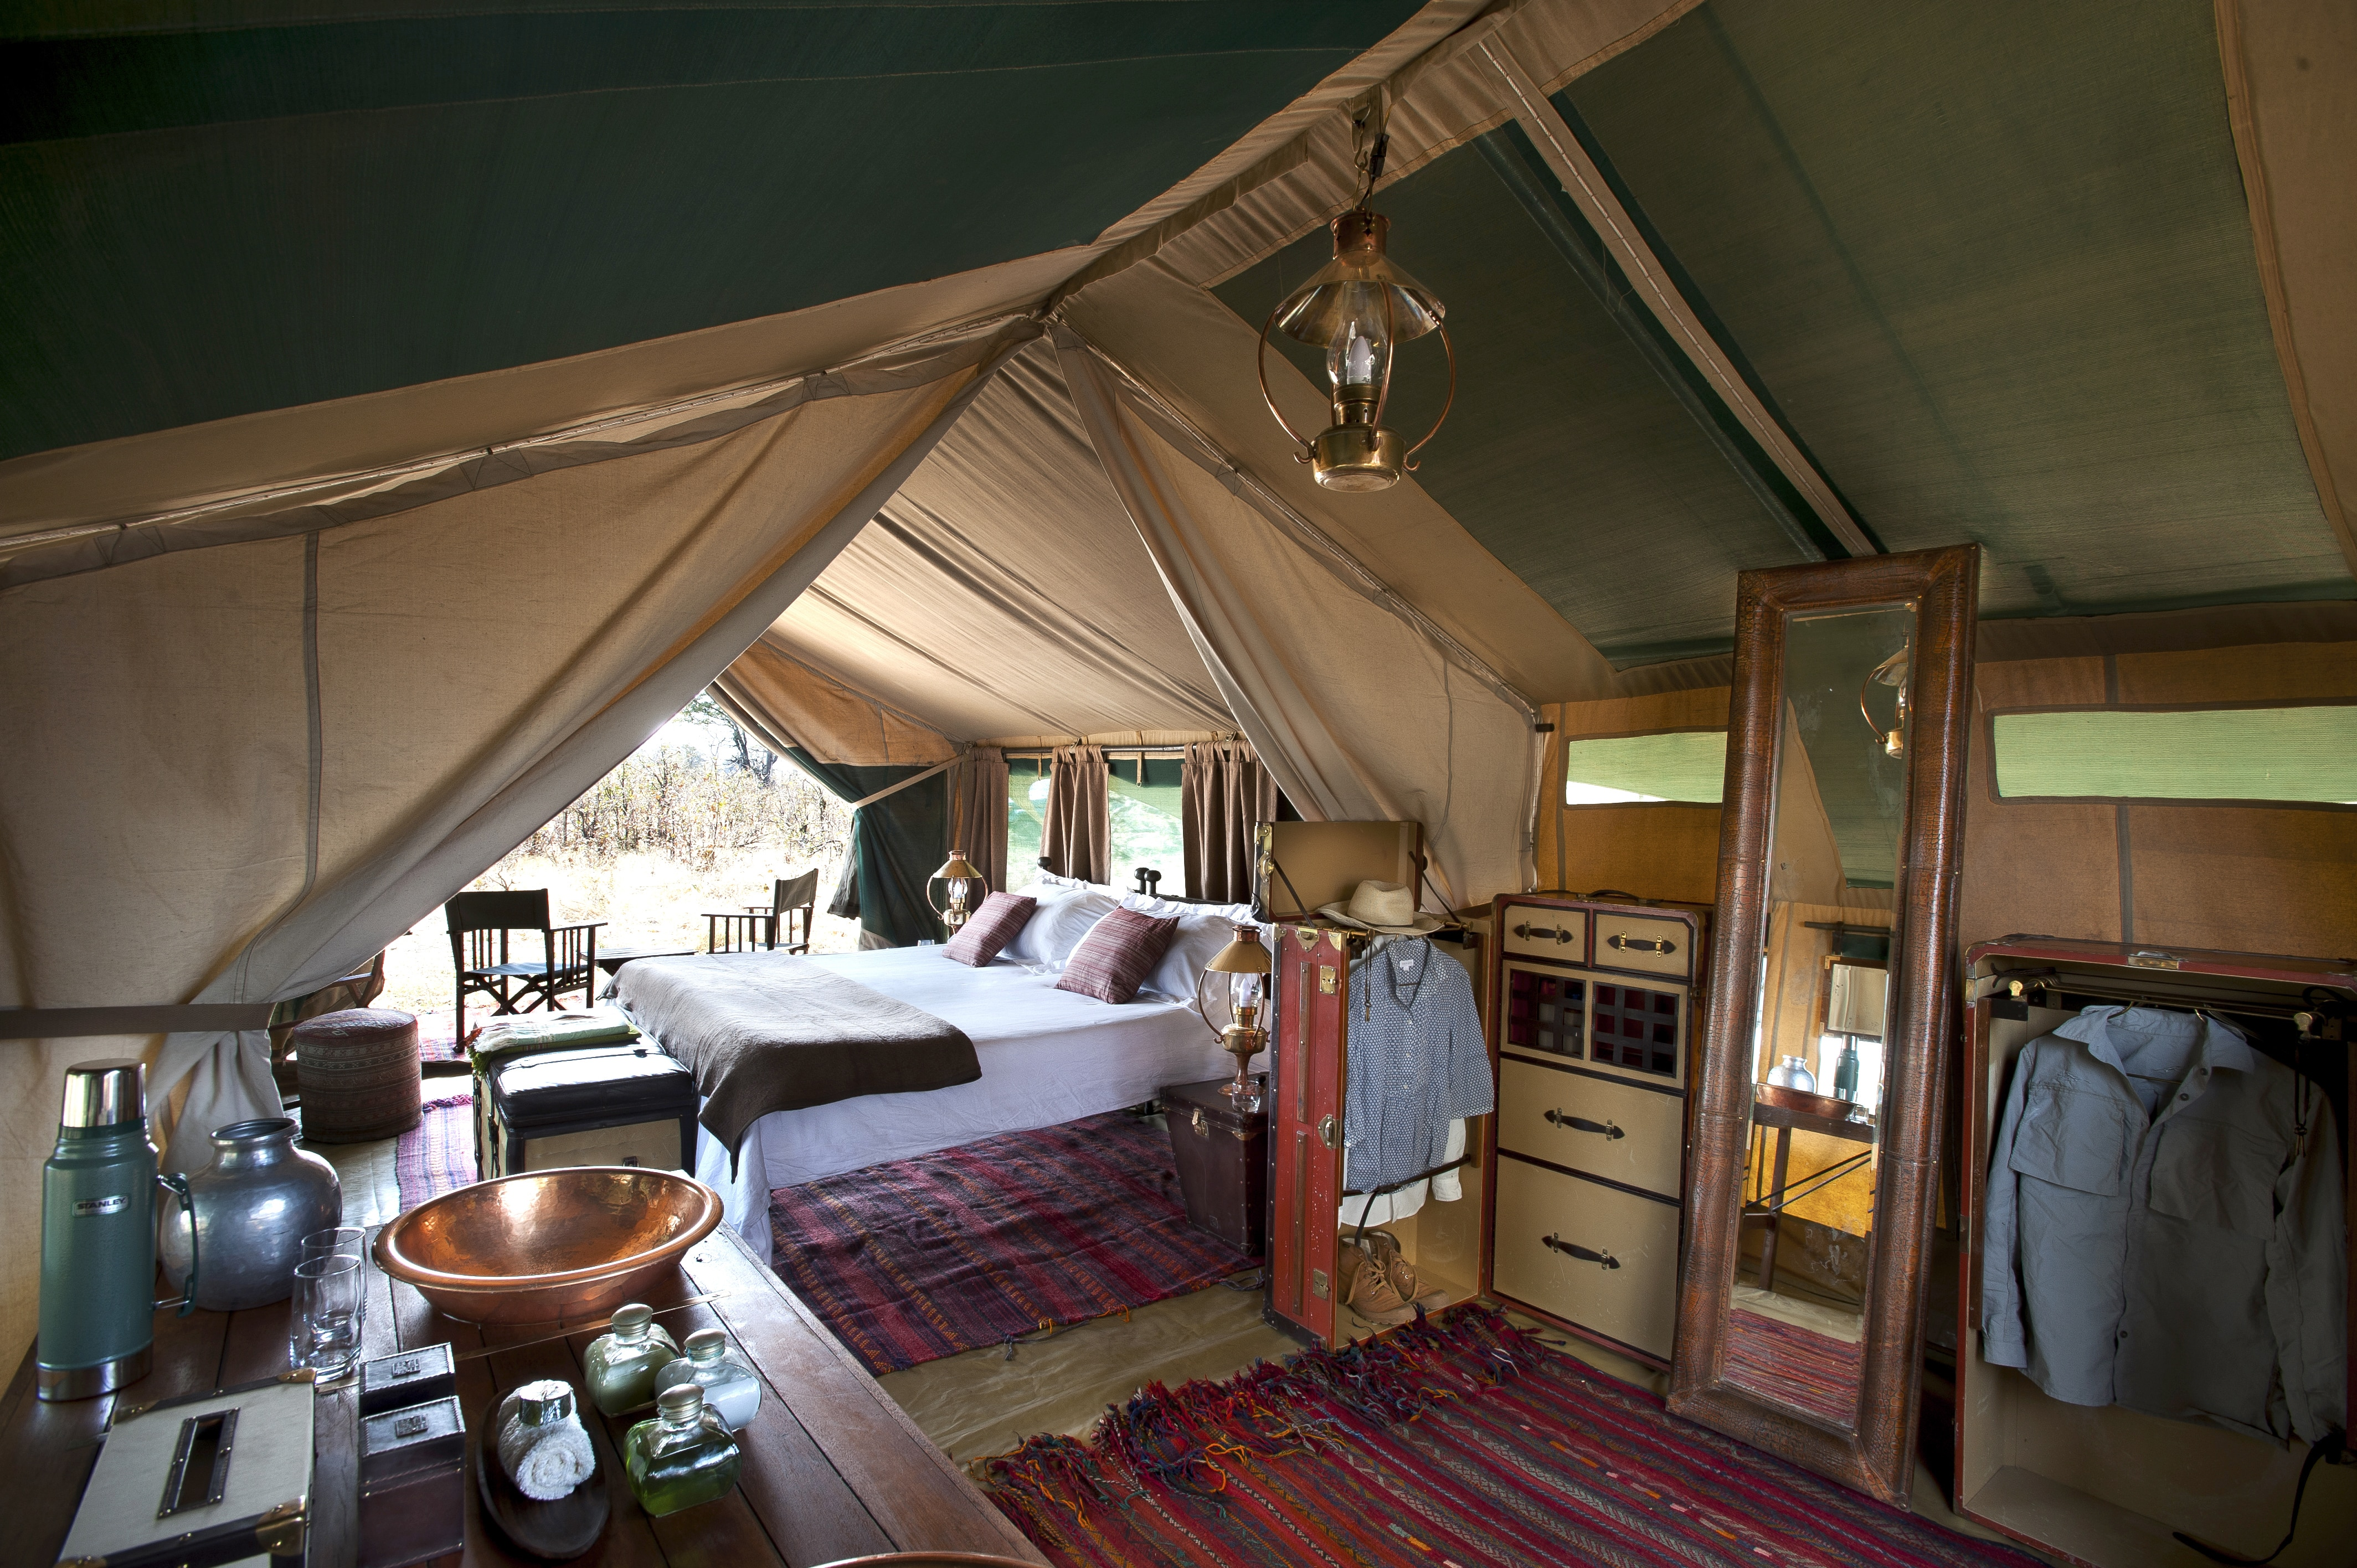 Africa,Botswana,Liyanti,Alojamiento,Selinda Explorer,interior tienda